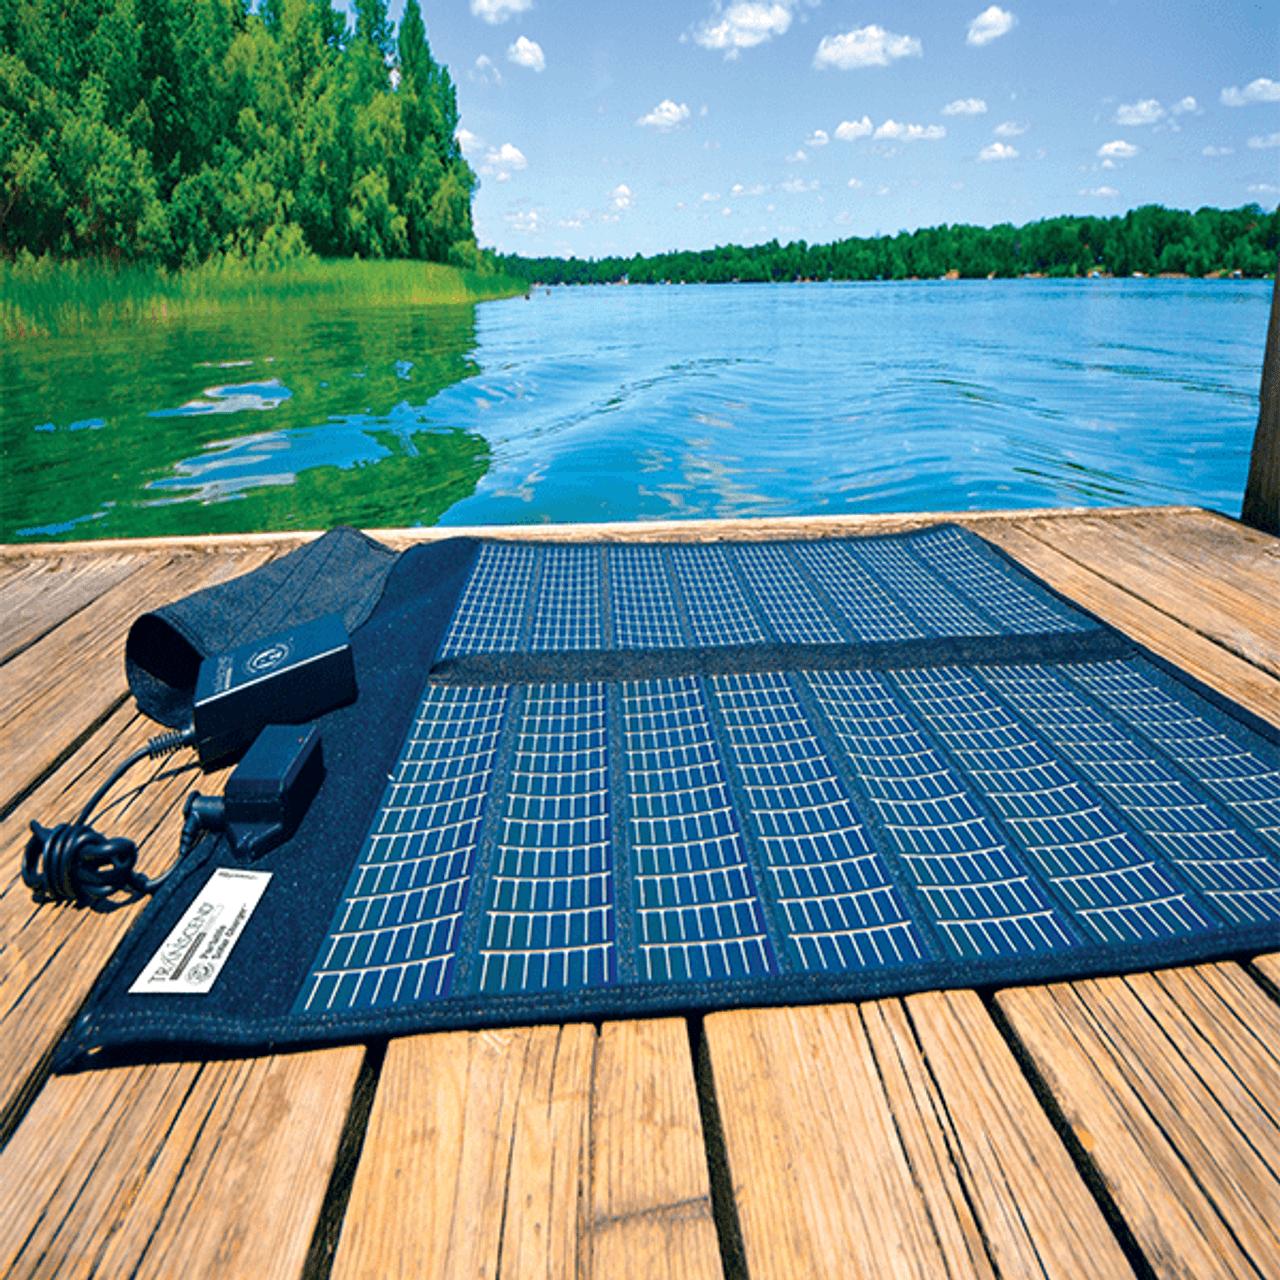 Buy Transcend Solar Panel Online